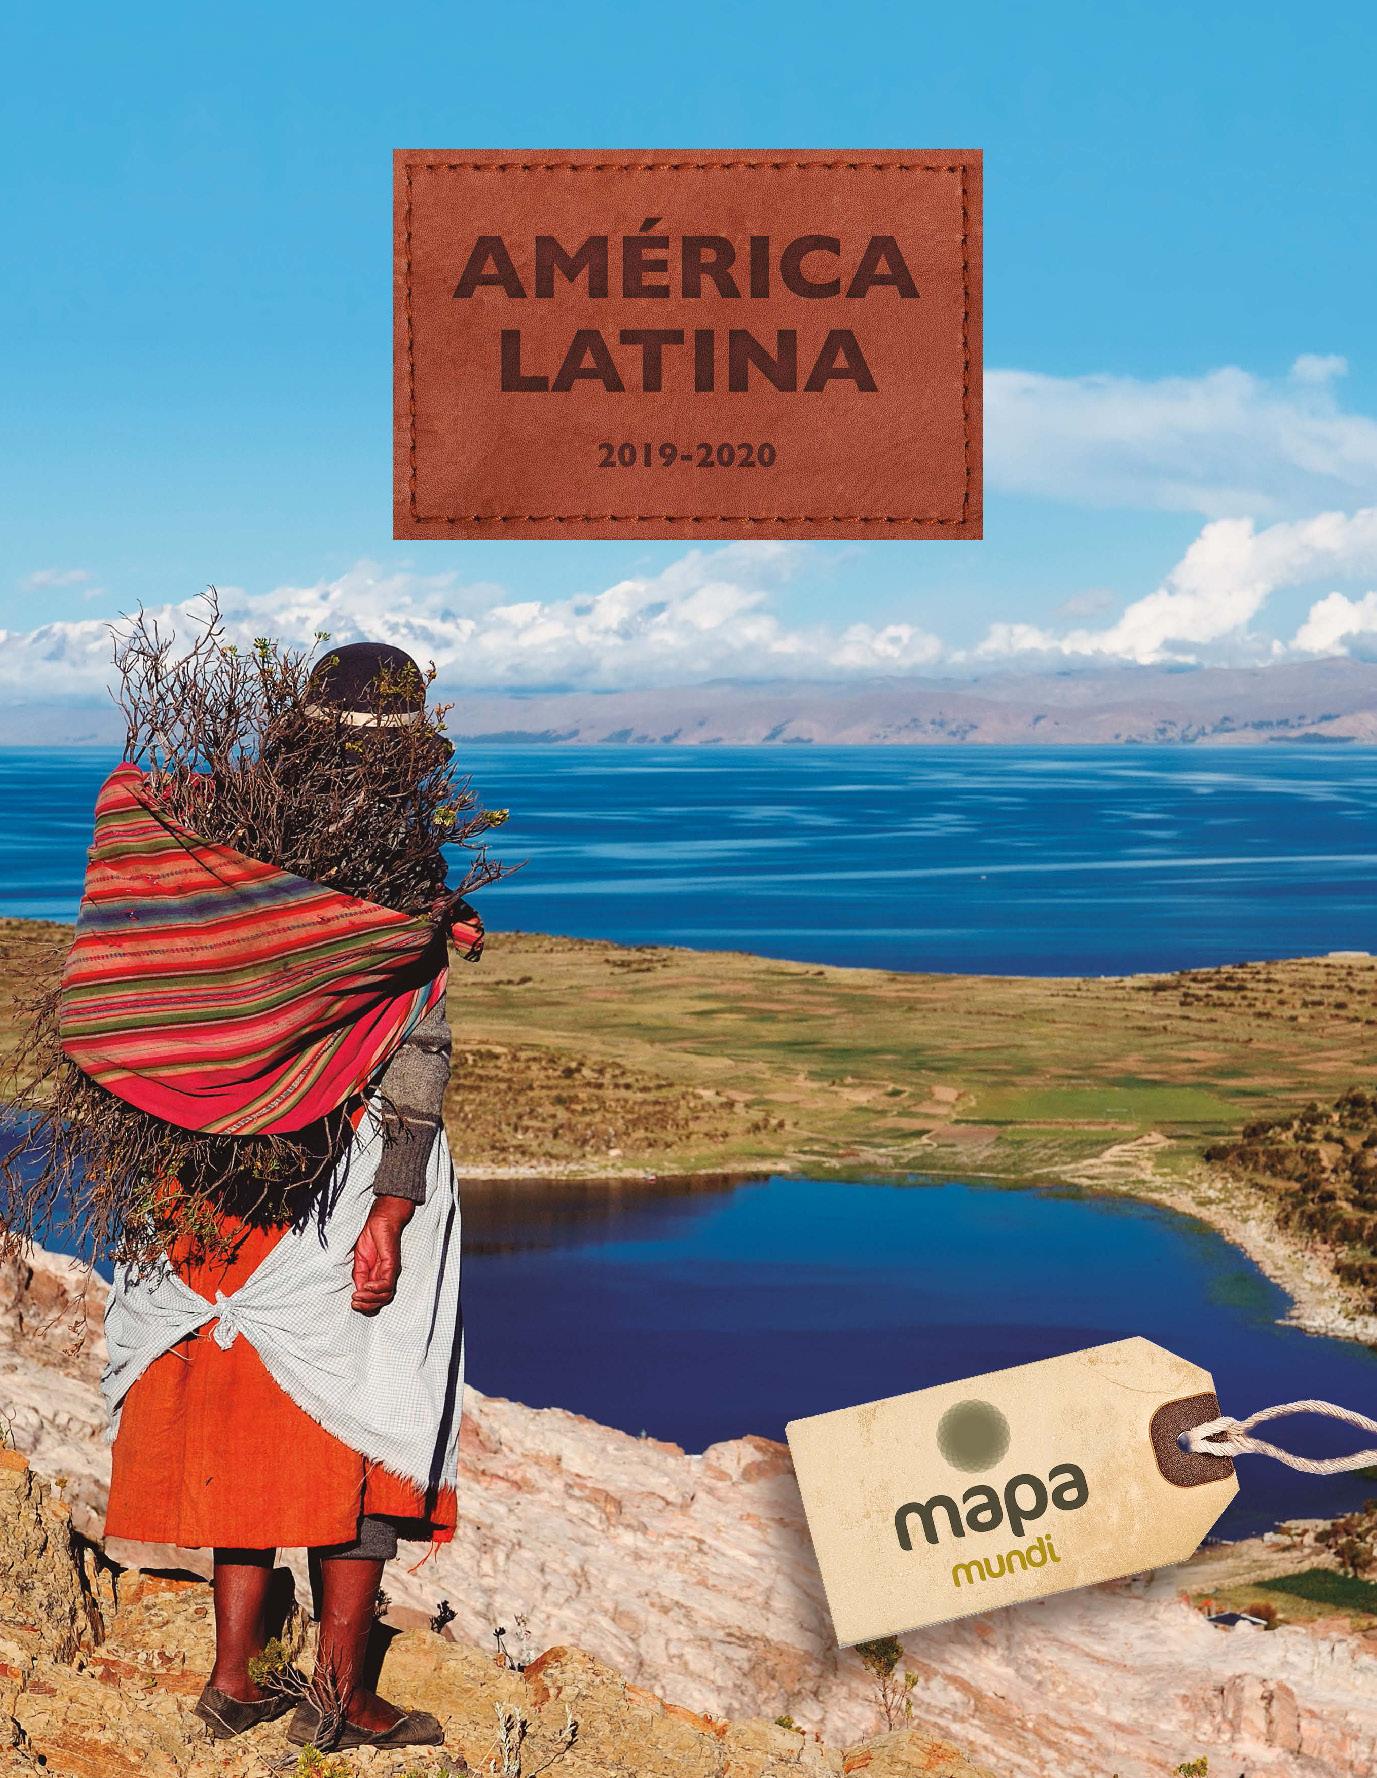 Catalogo Mapa Tours America Latina 2019-2020